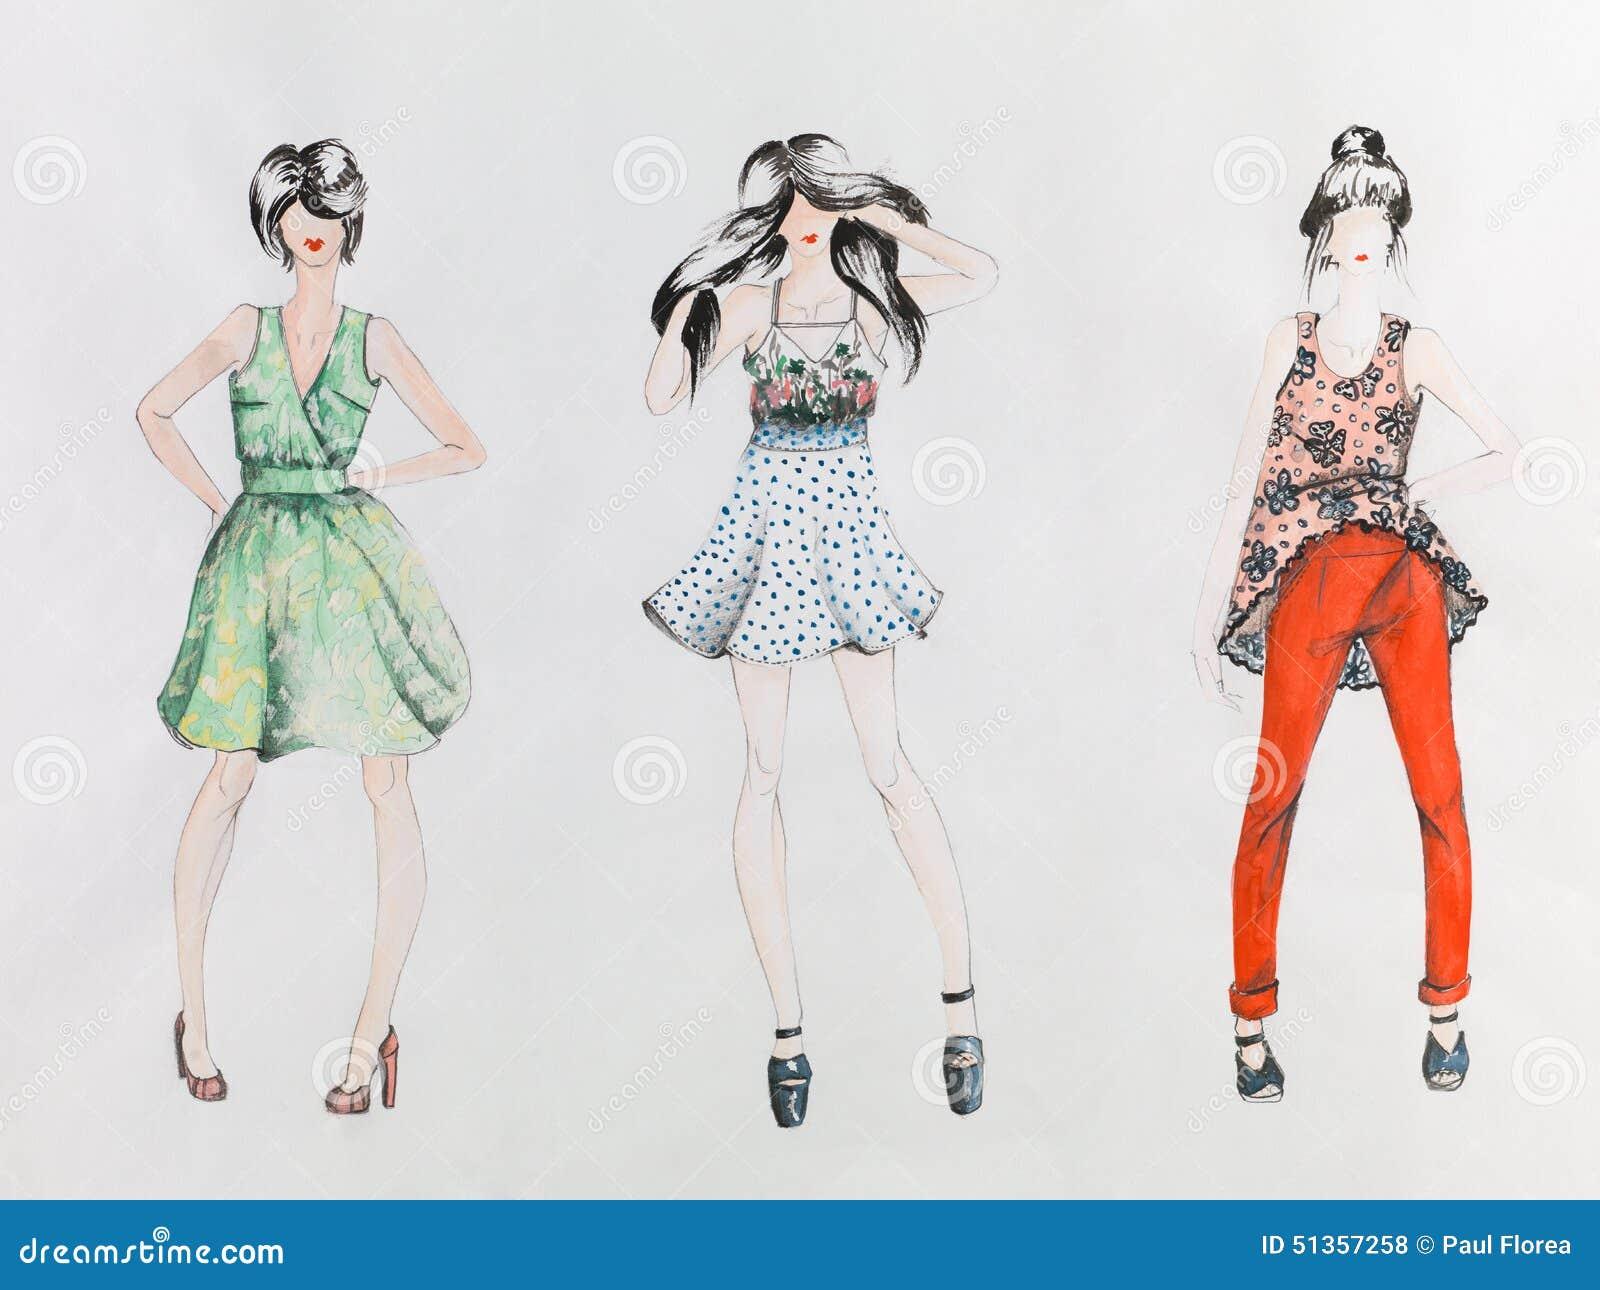 Basic Sketches For Fashion Designing